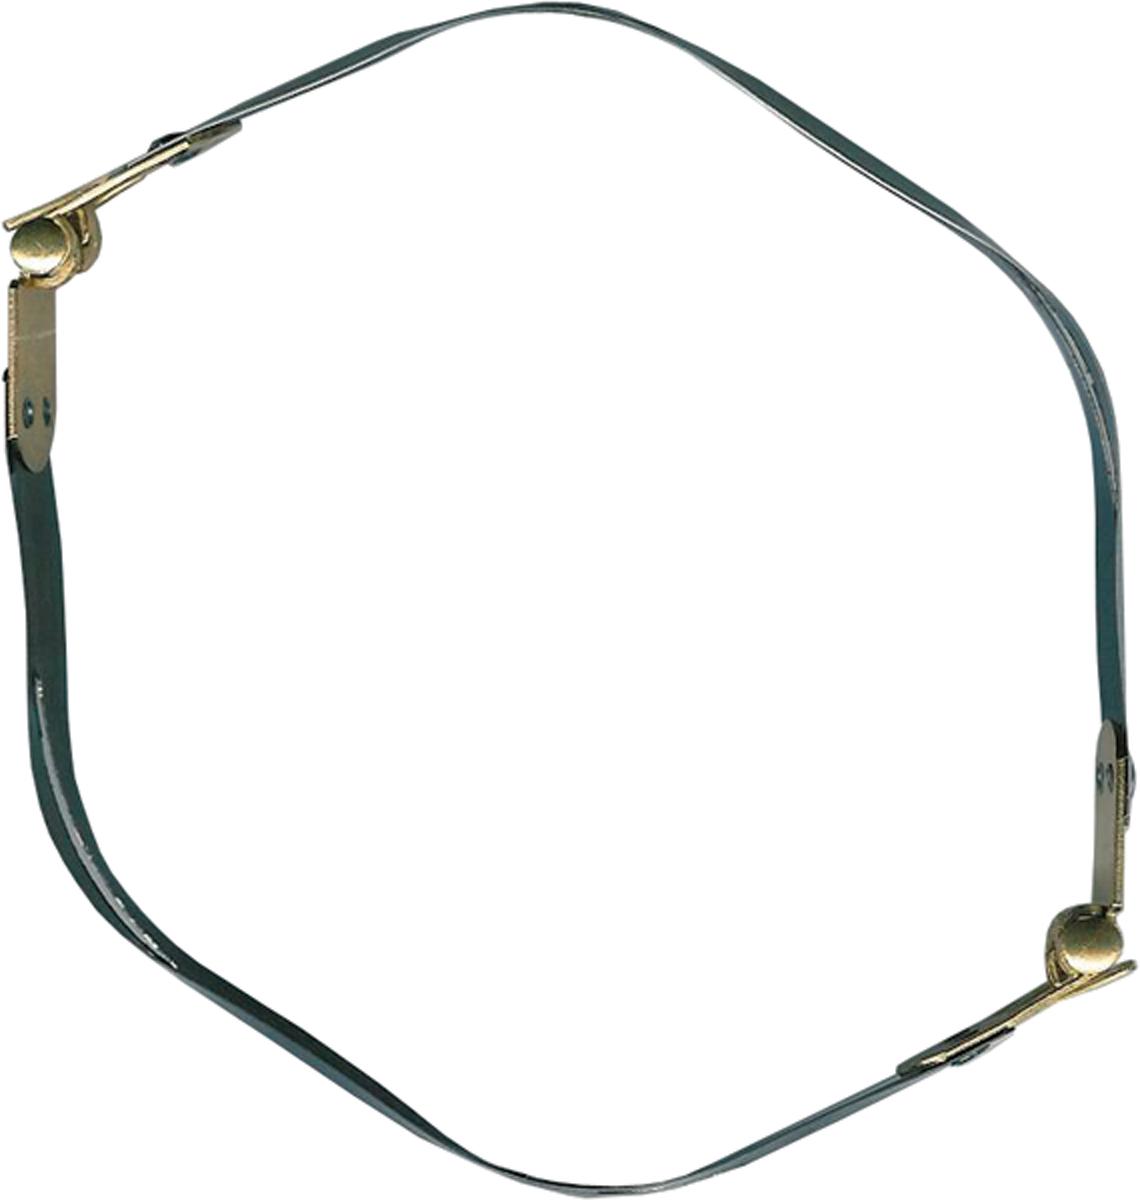 "Internal Flex Purse Frame 9""-Gold & Silver"